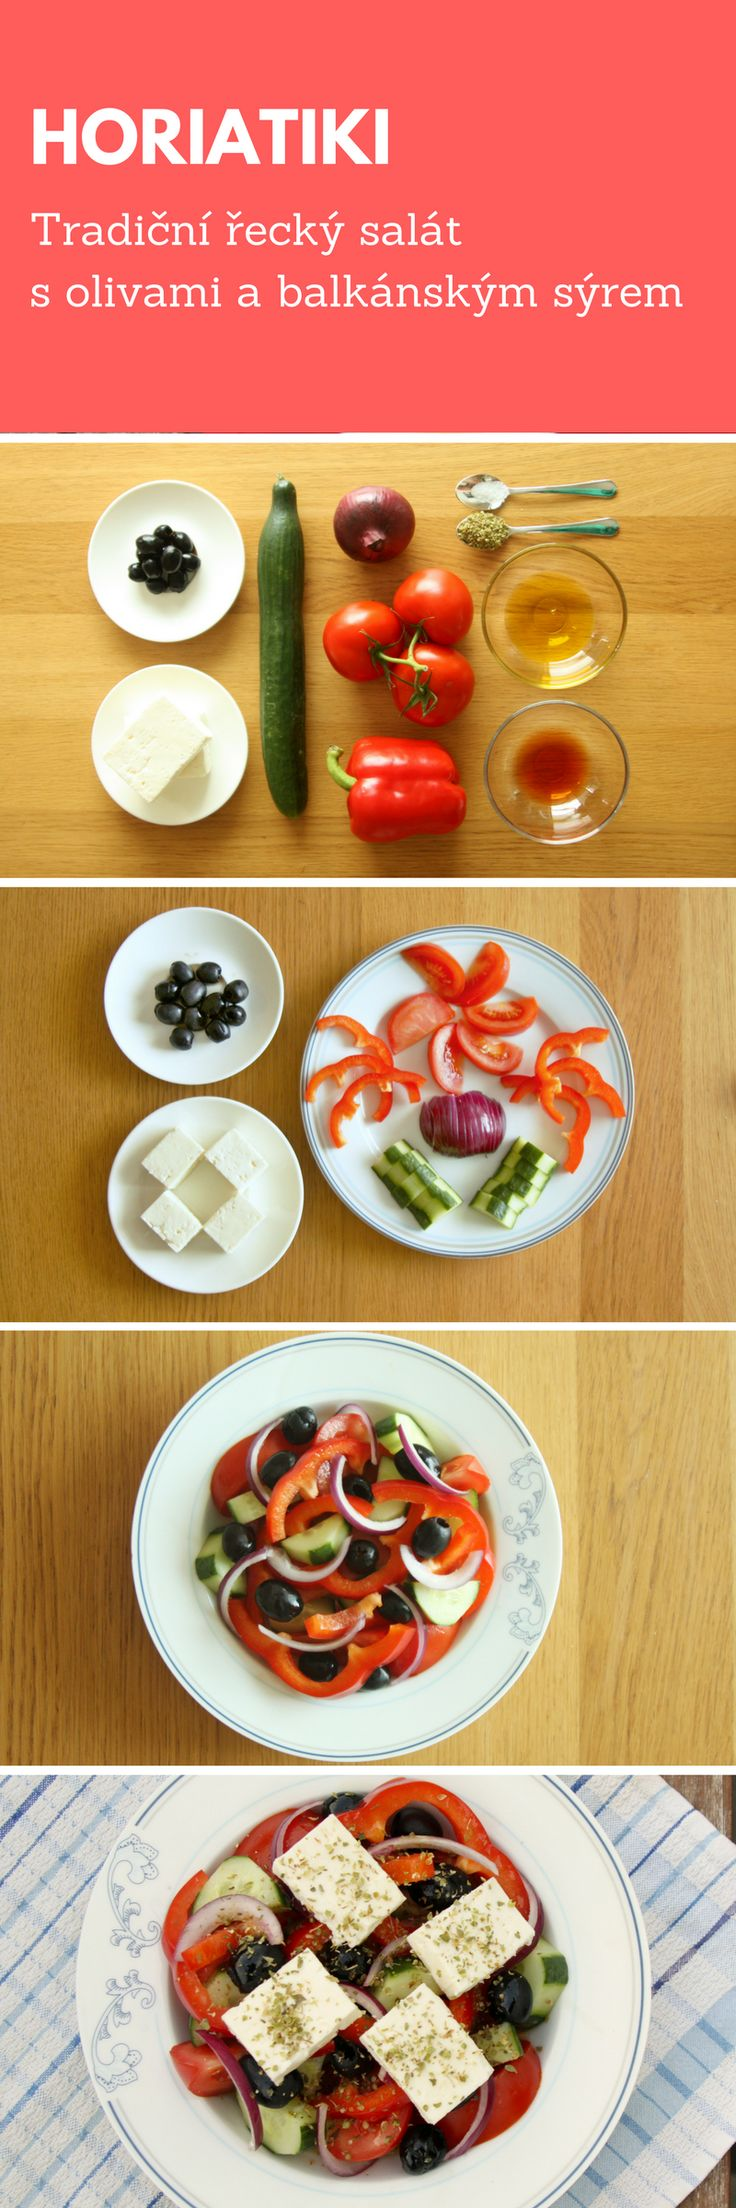 HORIATIKI - tradiční řecký salát s olivami a balkánským sýrem. #horiatiki #reckysalat #salat #salaty #recko #olivy #olivovyolej #cerneolivy #balkanskysyr #syr #paprika #okurka #okurek #rajce #cibule #oregano #sul